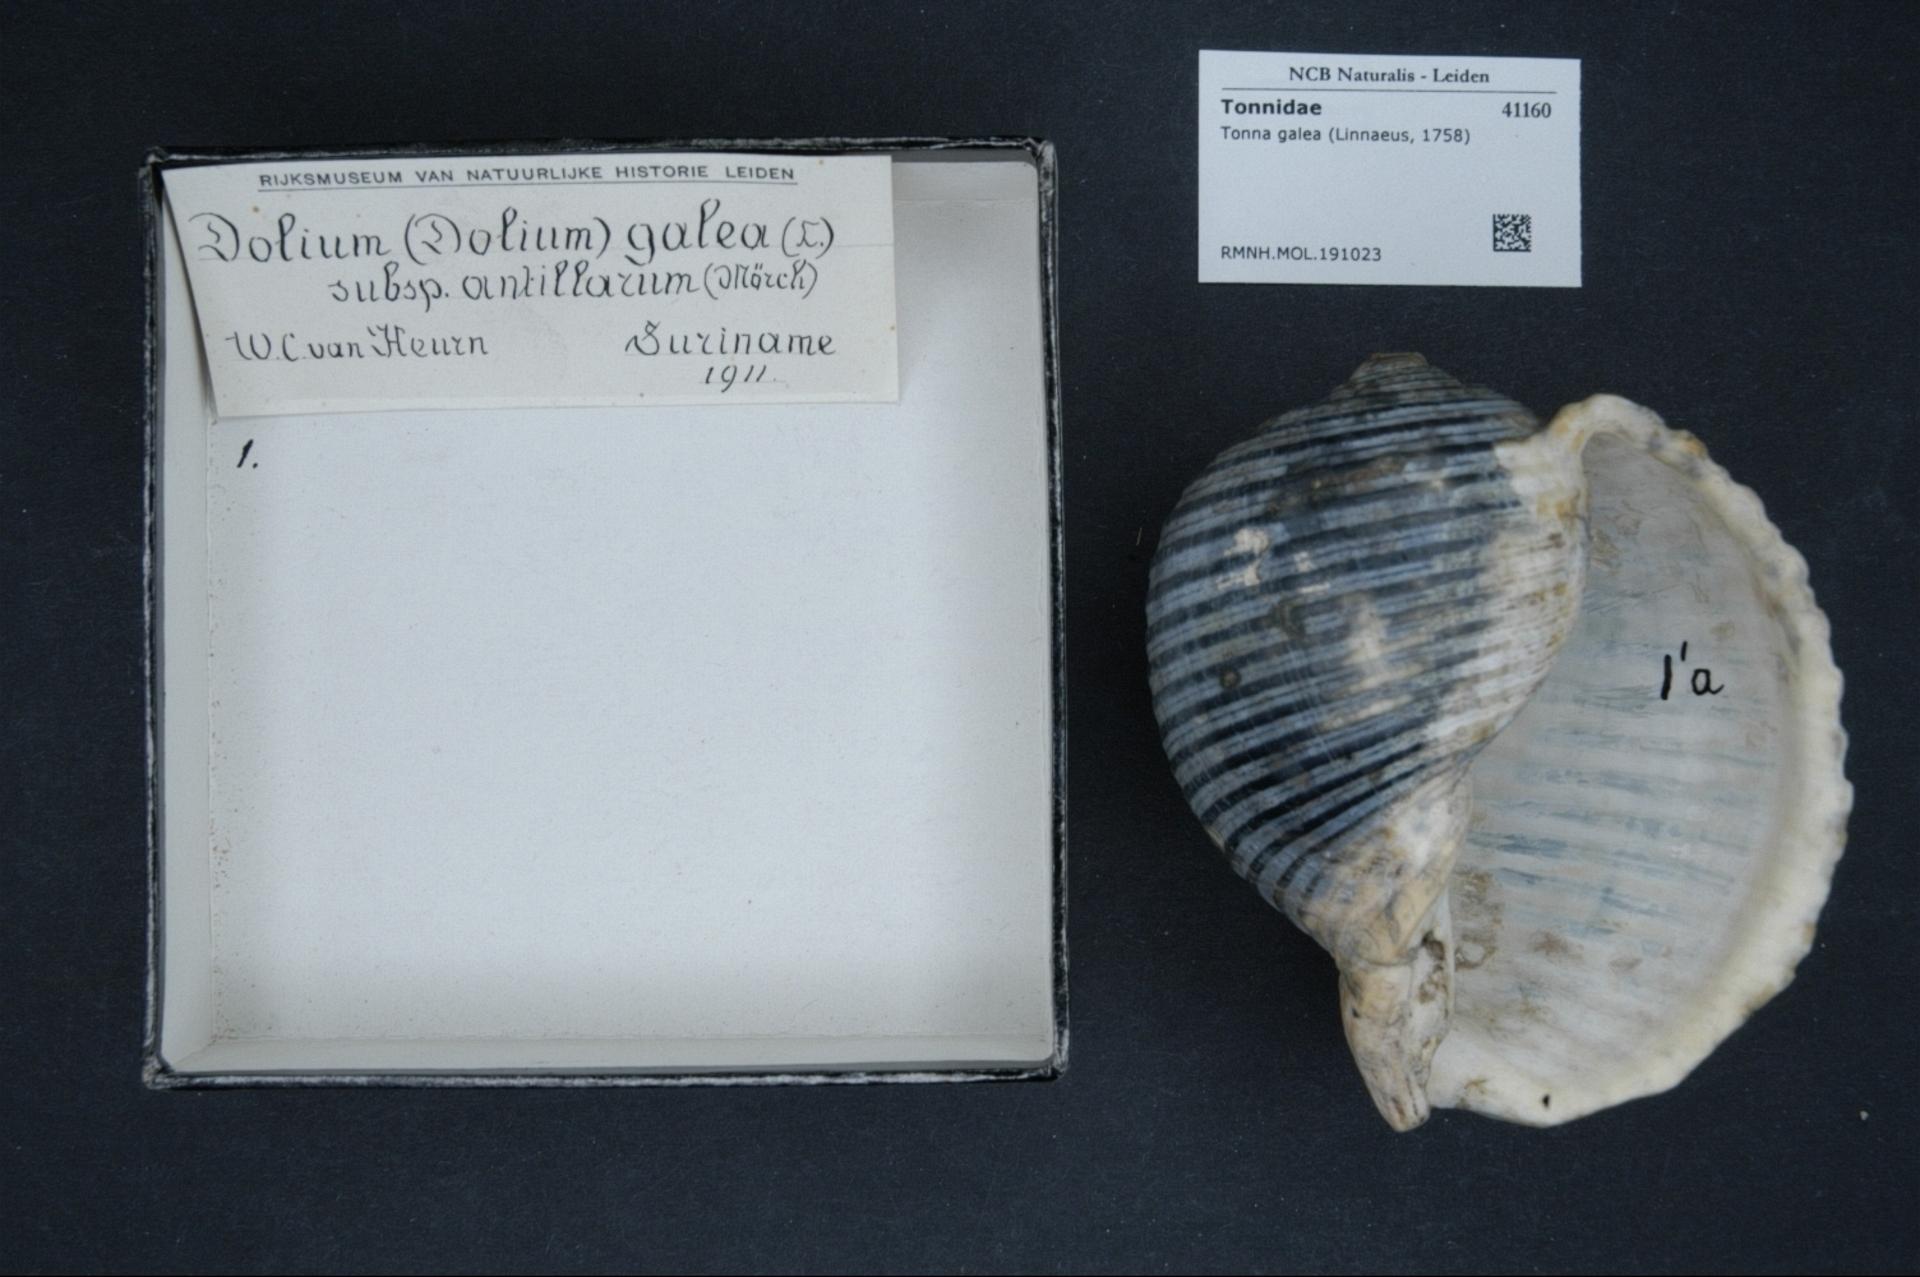 RMNH.MOL.191023 | Tonna galea (Linnaeus, 1758)